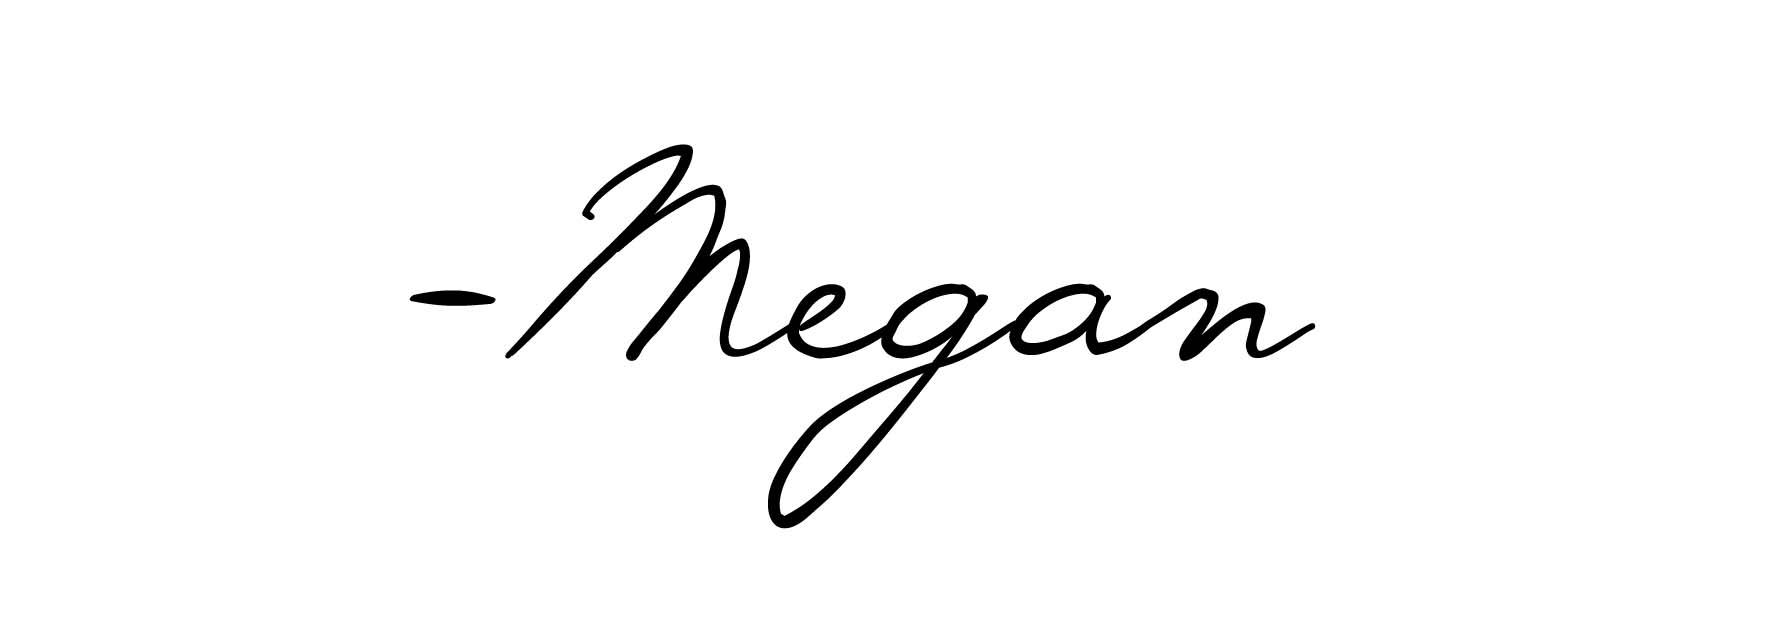 Darling Be Brave - Blog Signature